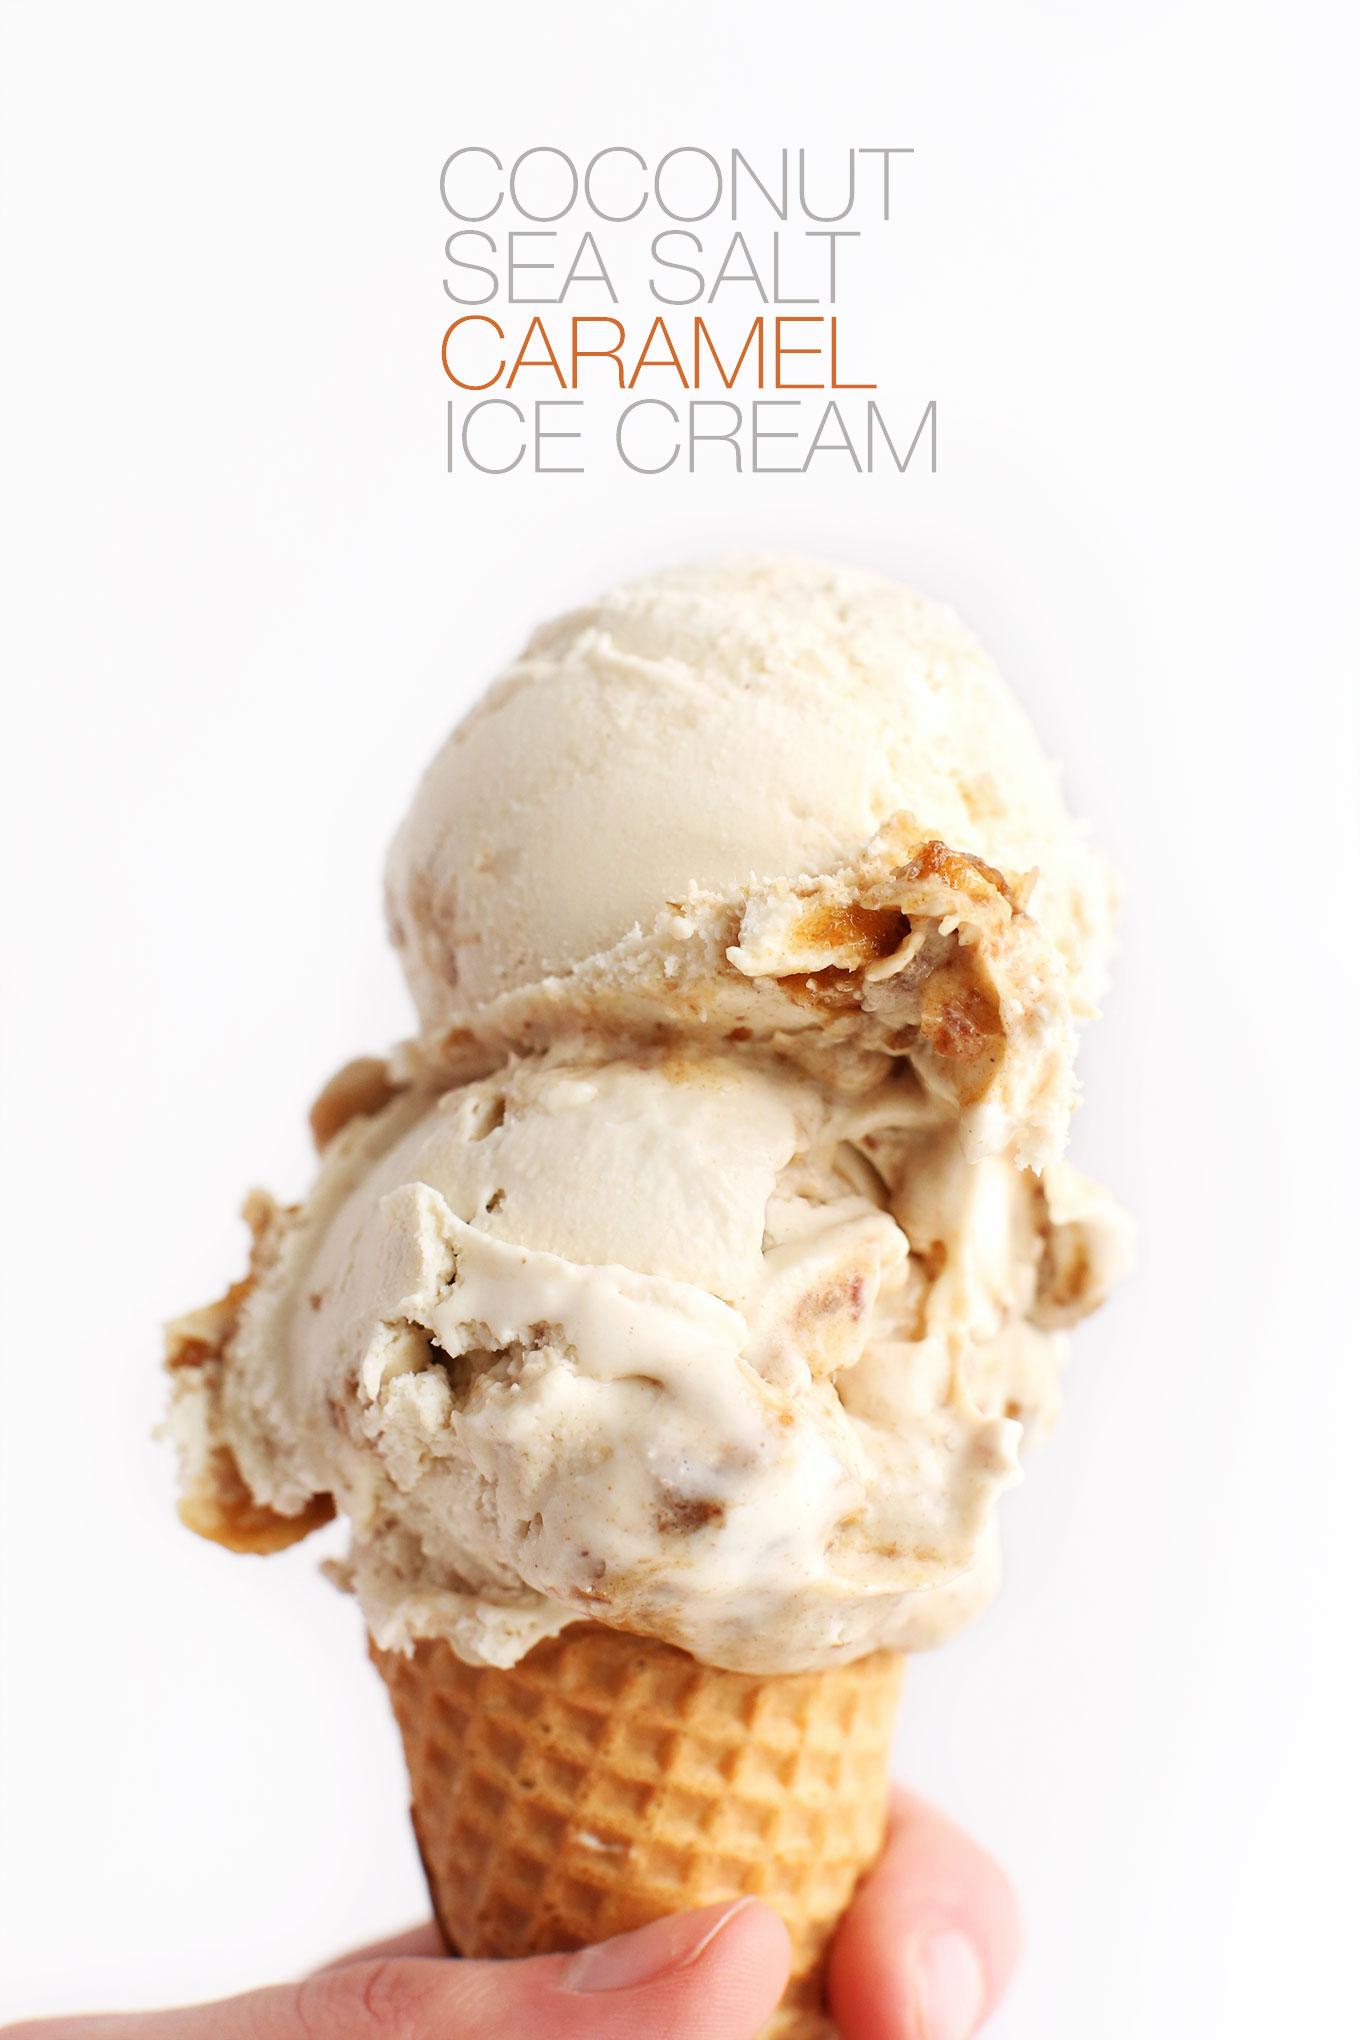 AMAZING-Creamy-Coconut-Ice-Cream-with-Sea-Salt-Caramel-vegan-glutenfree